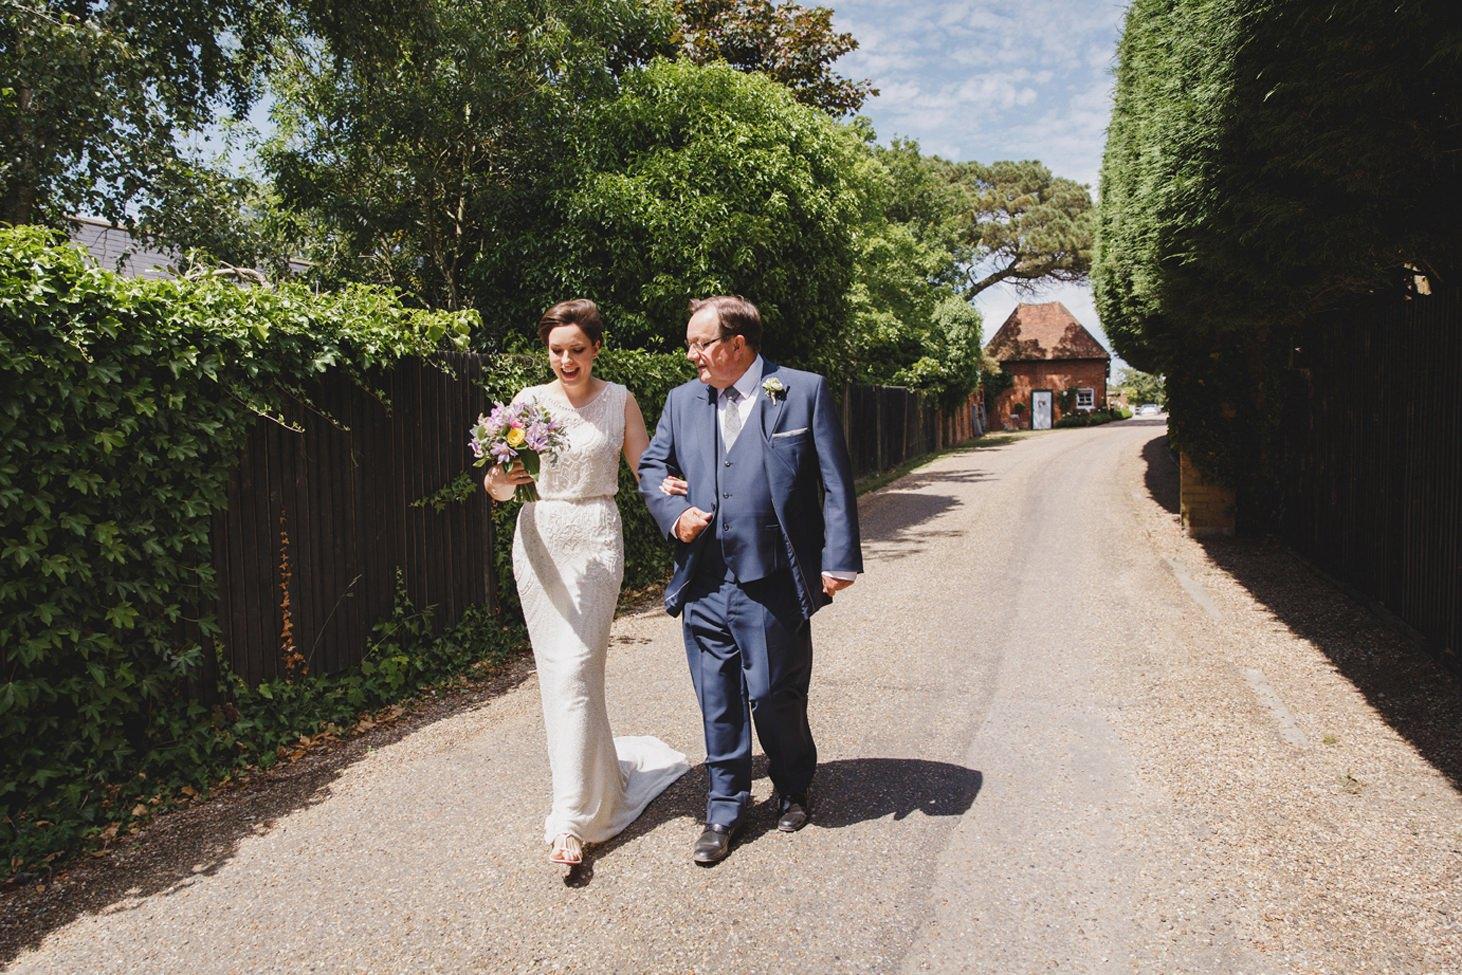 Gaynes park relaxed rustic wedding sarah ann wright 019